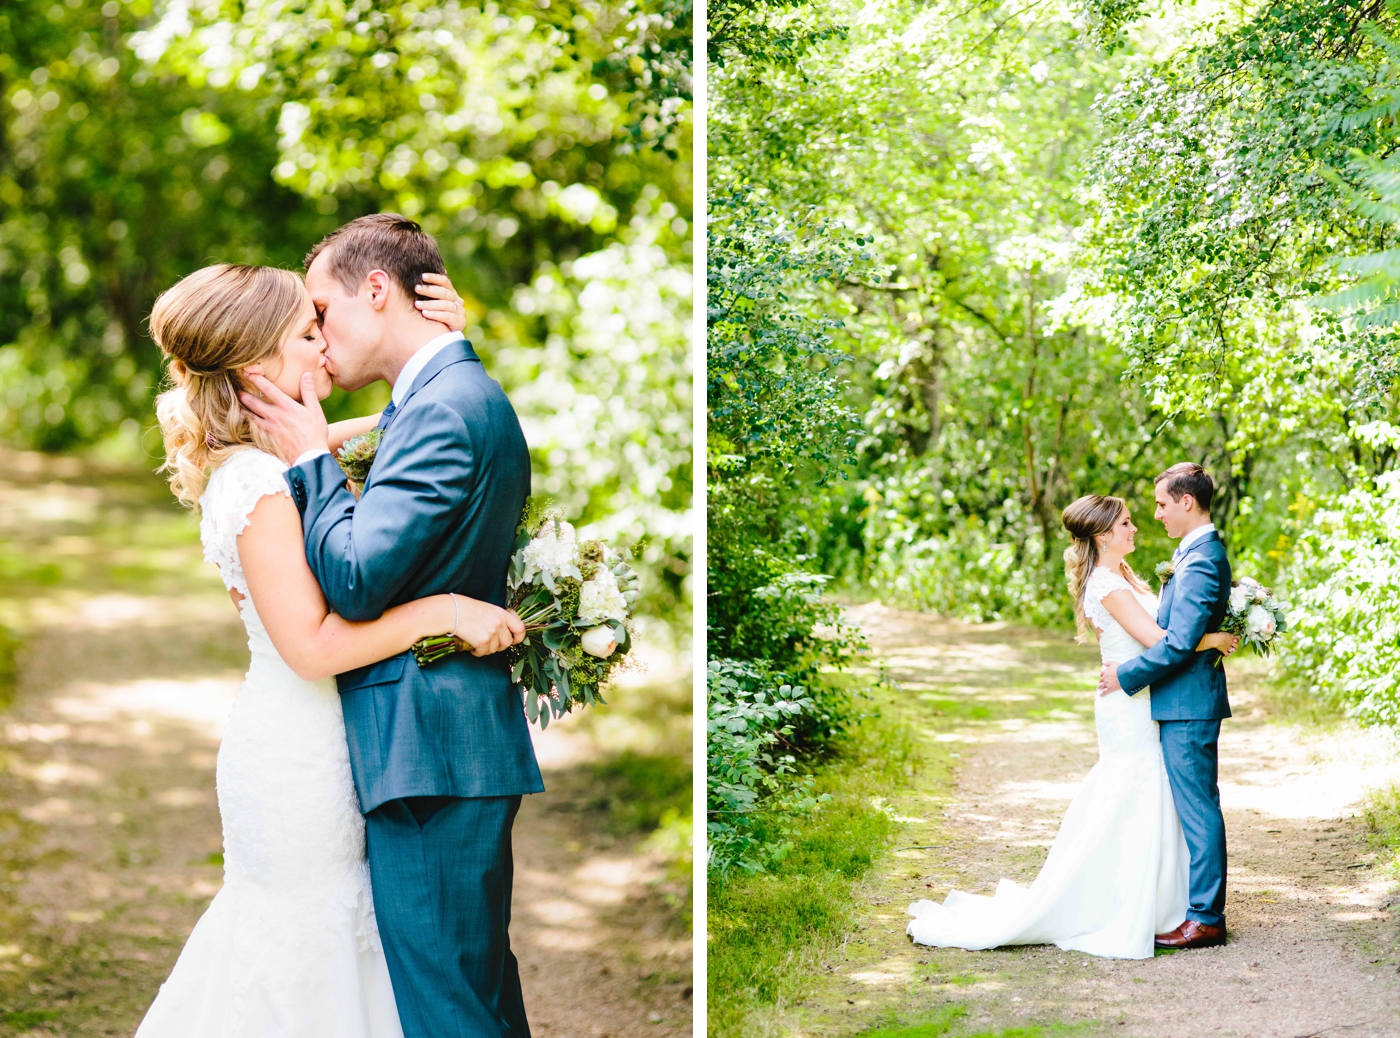 chicago-fine-art-wedding-photography-chiapetta16